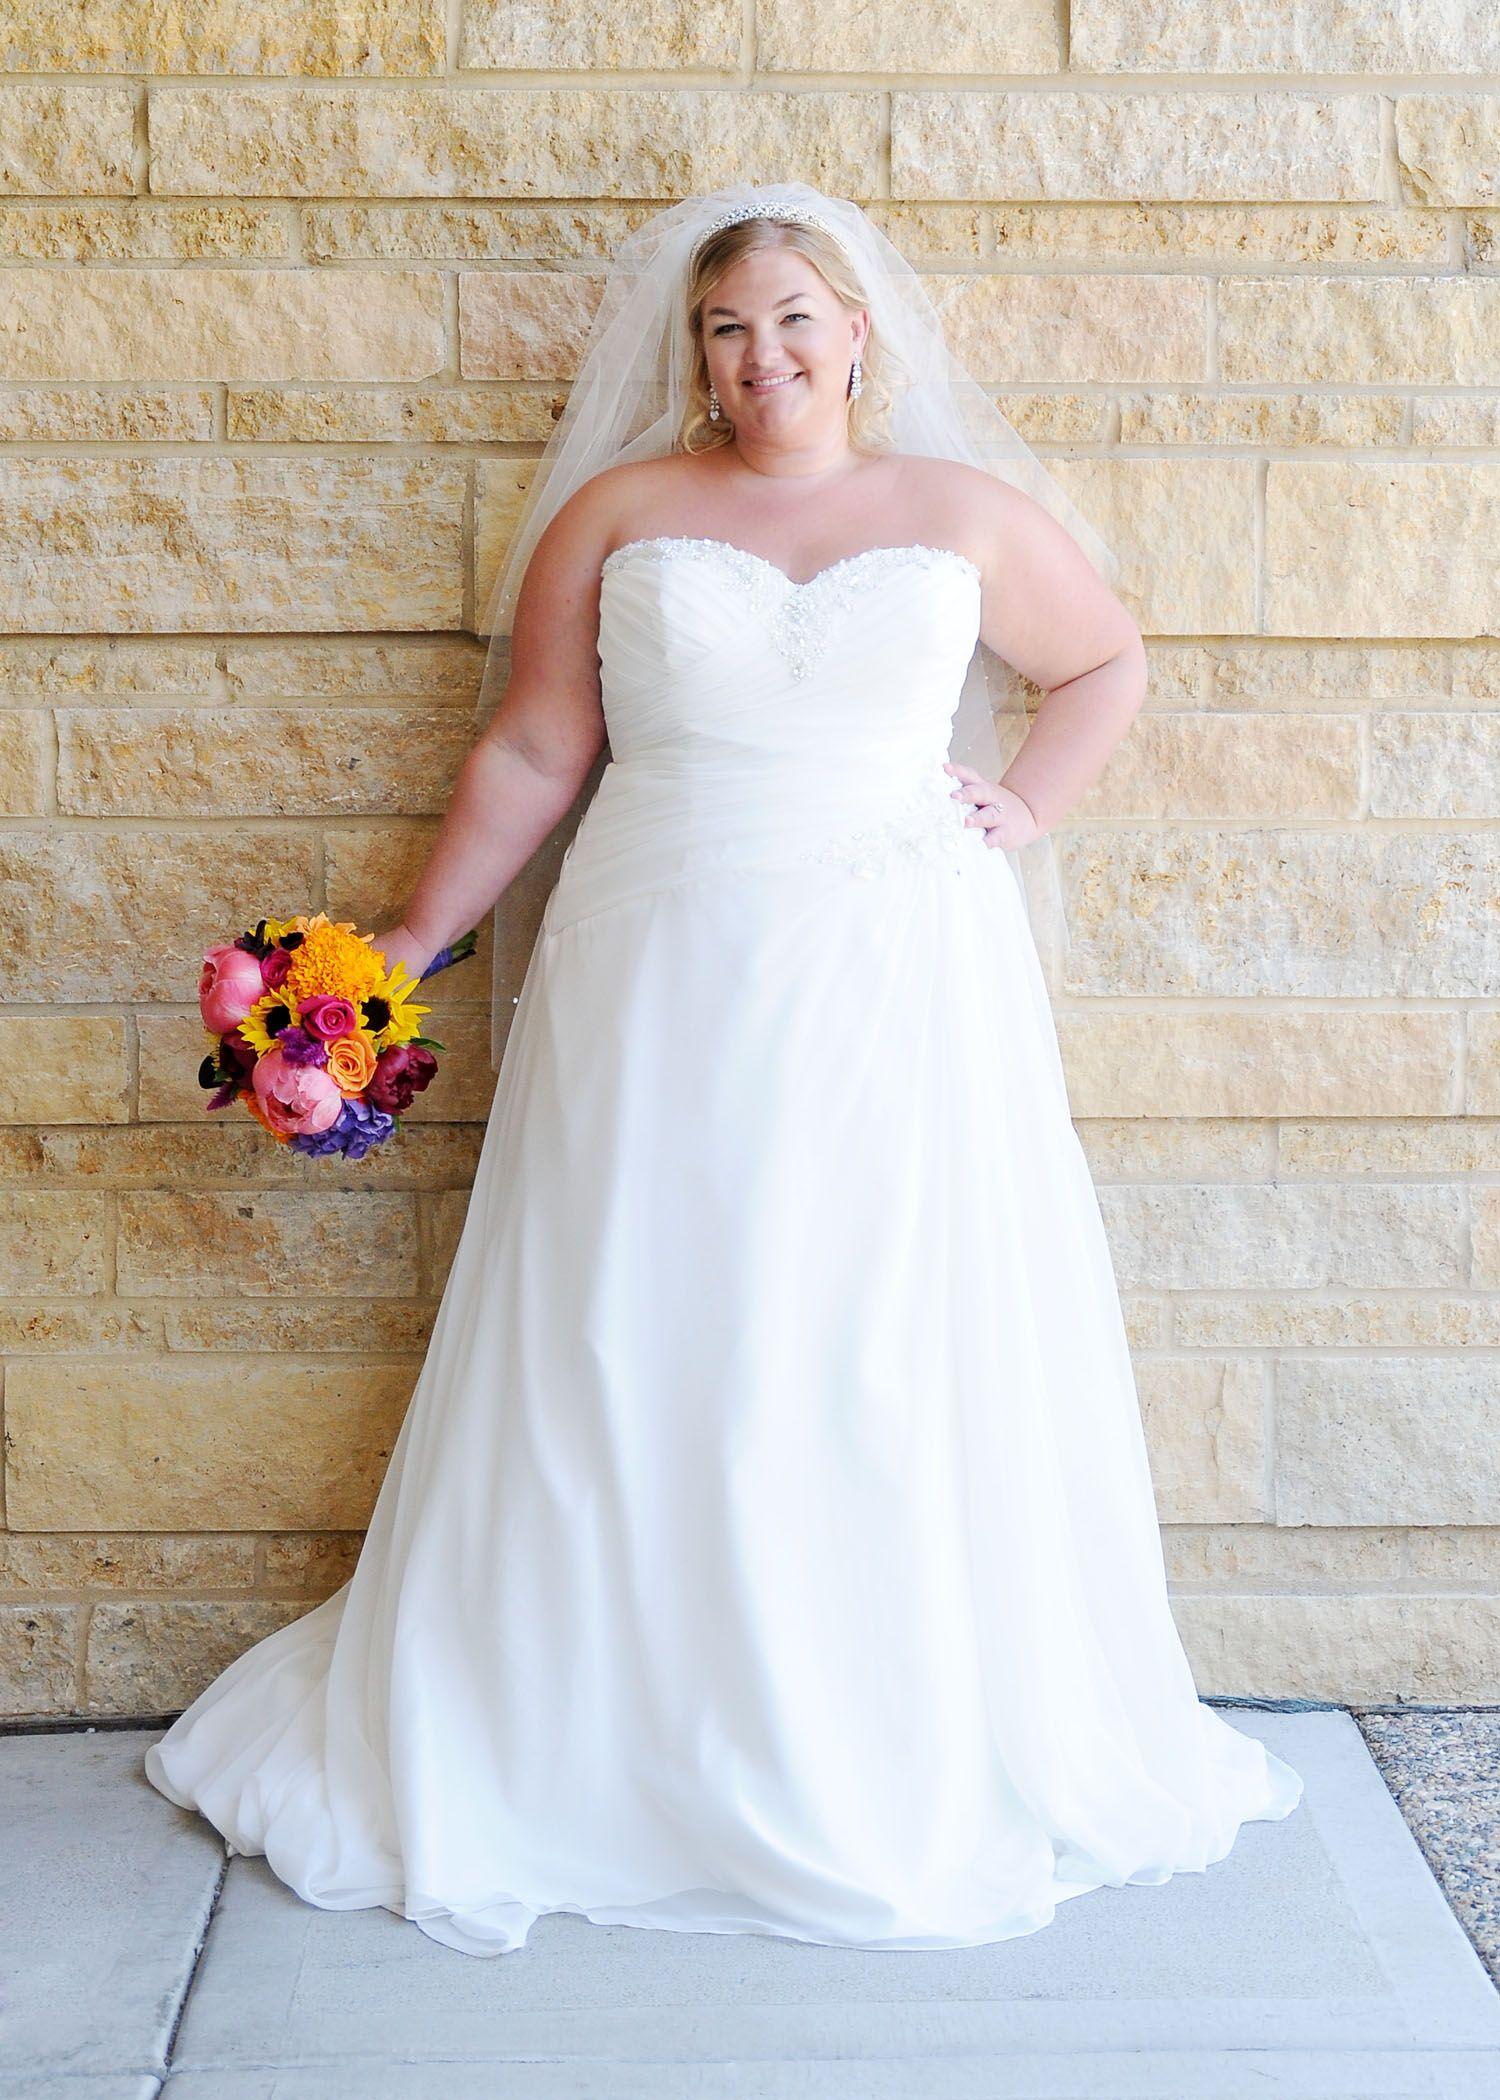 Plus size bridal gown, Curvy Bride, Luxe Bridal Curvy Bridal ...